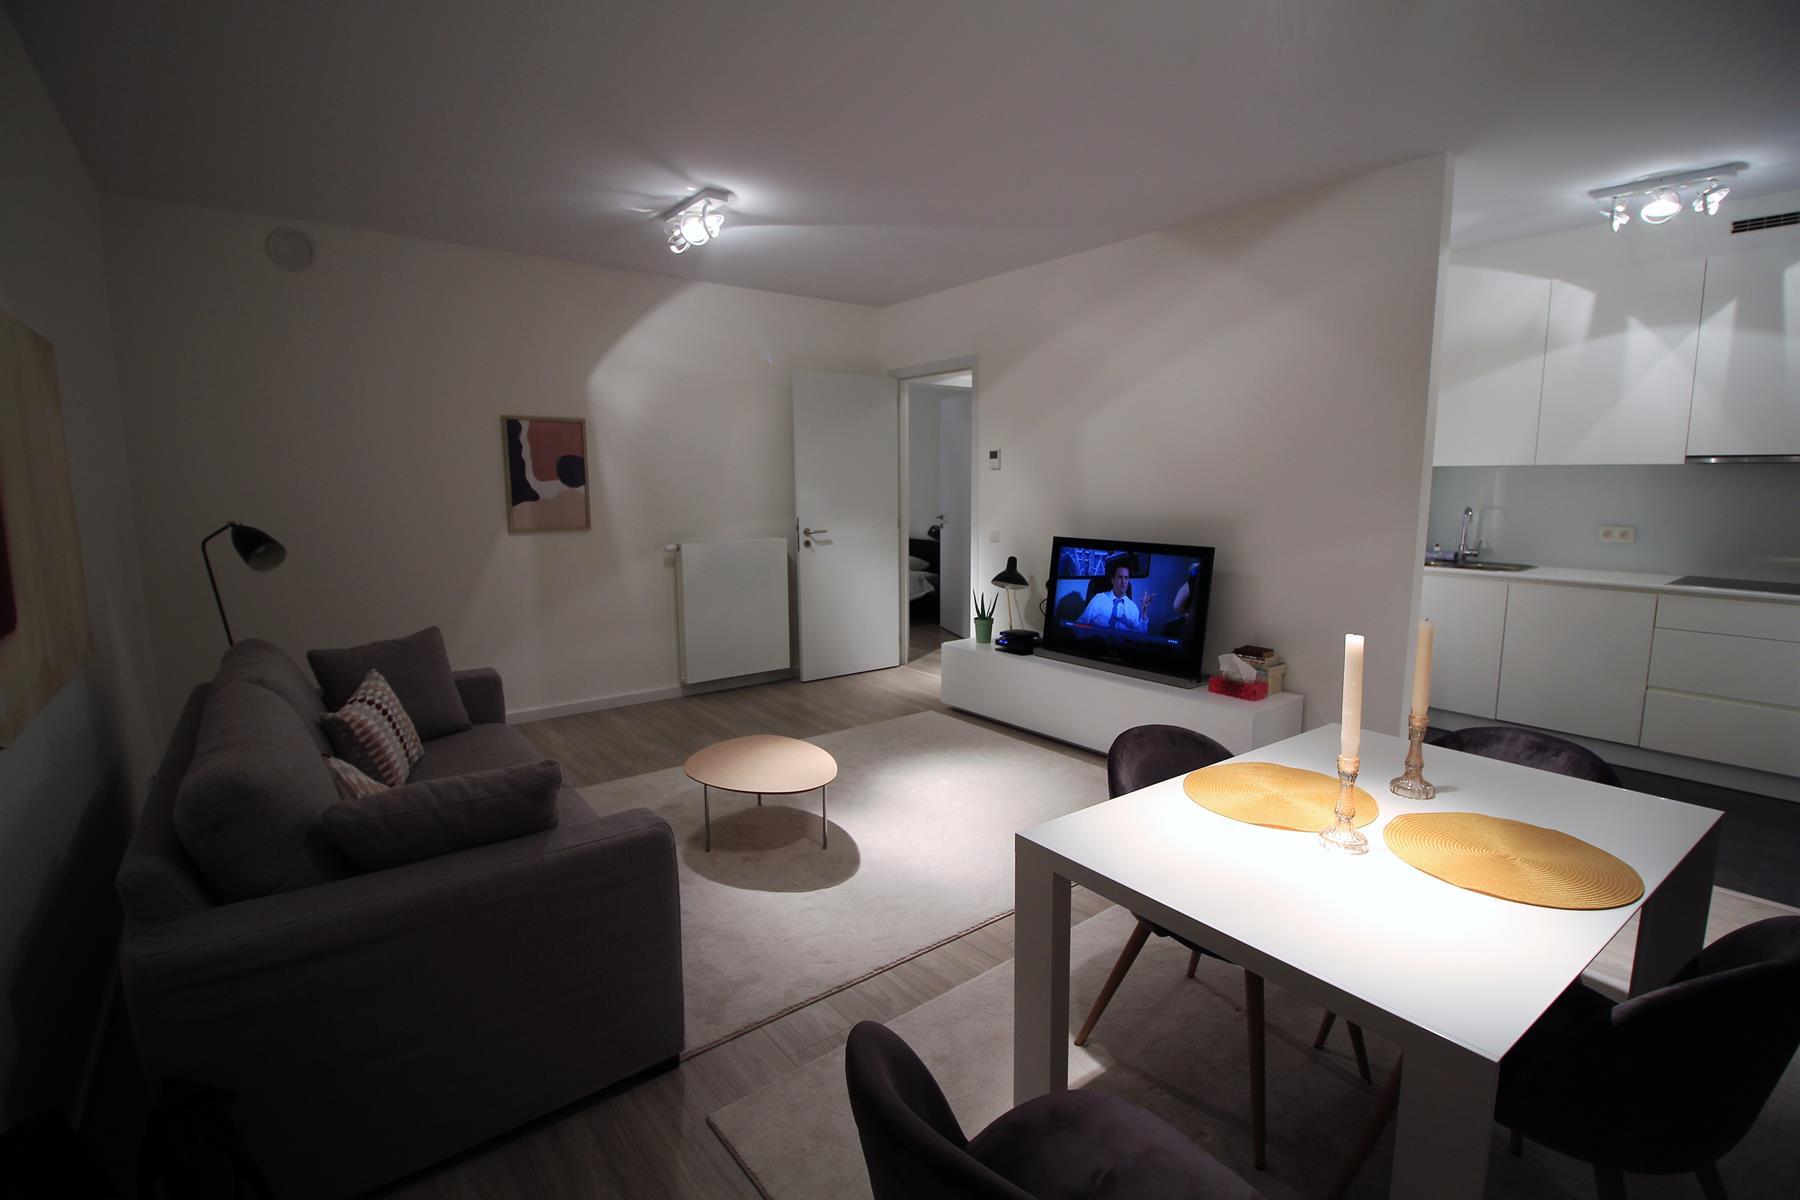 Appartement - Woluwe-Saint-Lambert - #4134958-1